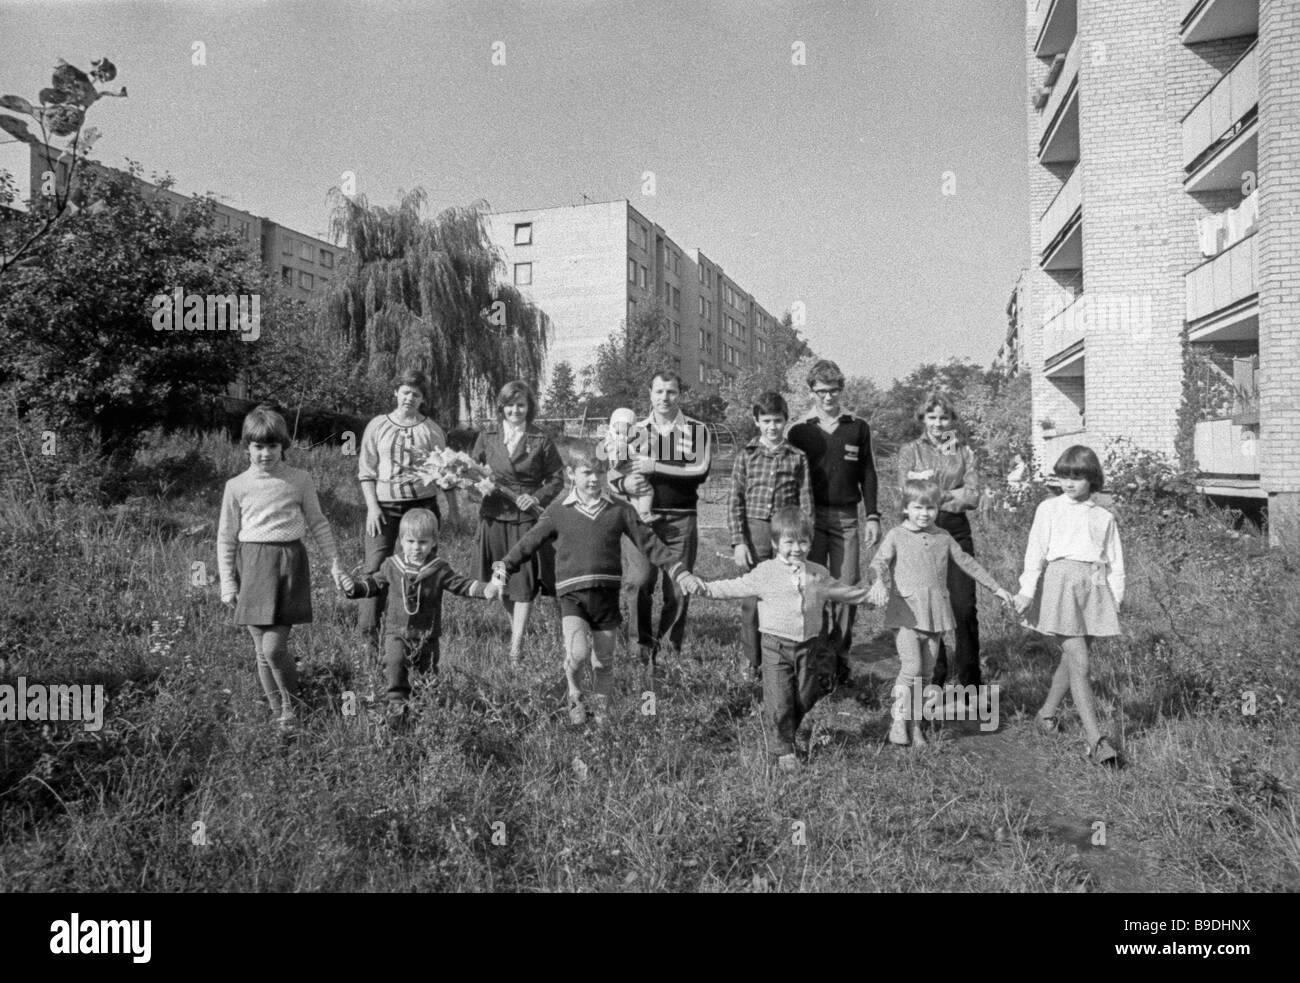 This family of Vilnius has eleven children - Stock Image